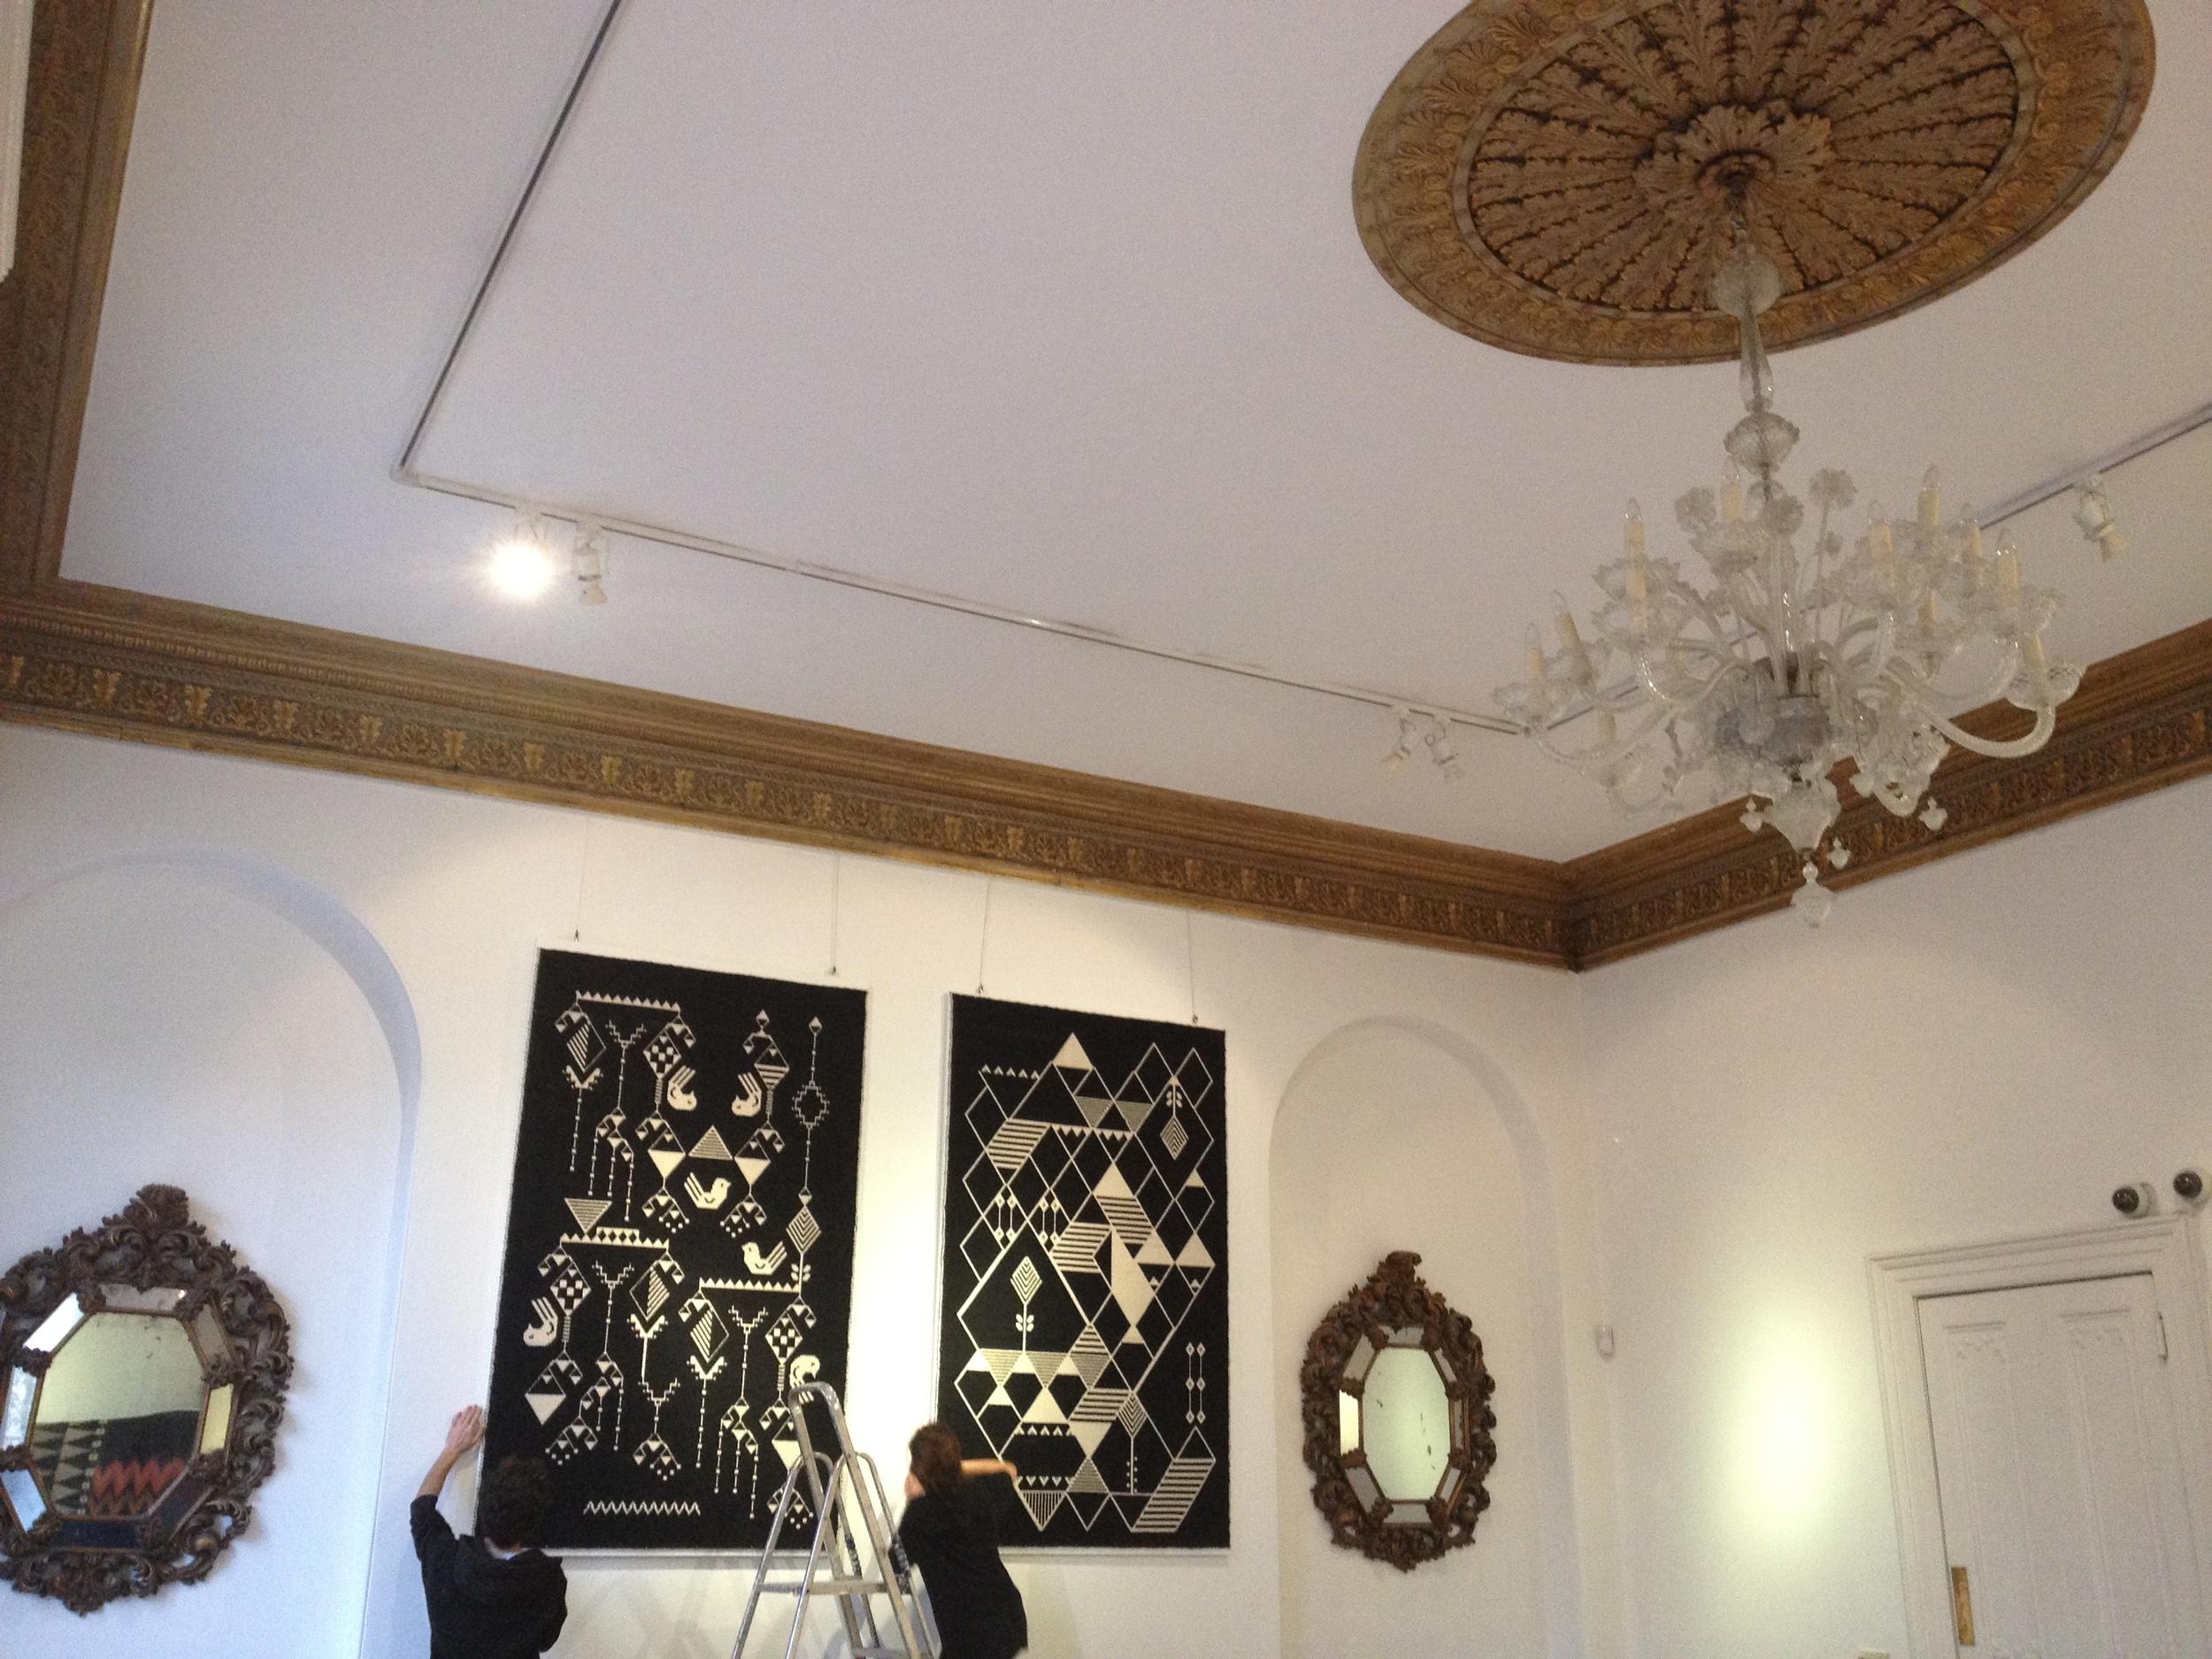 Exhibition at Italian Cultural Institute, London